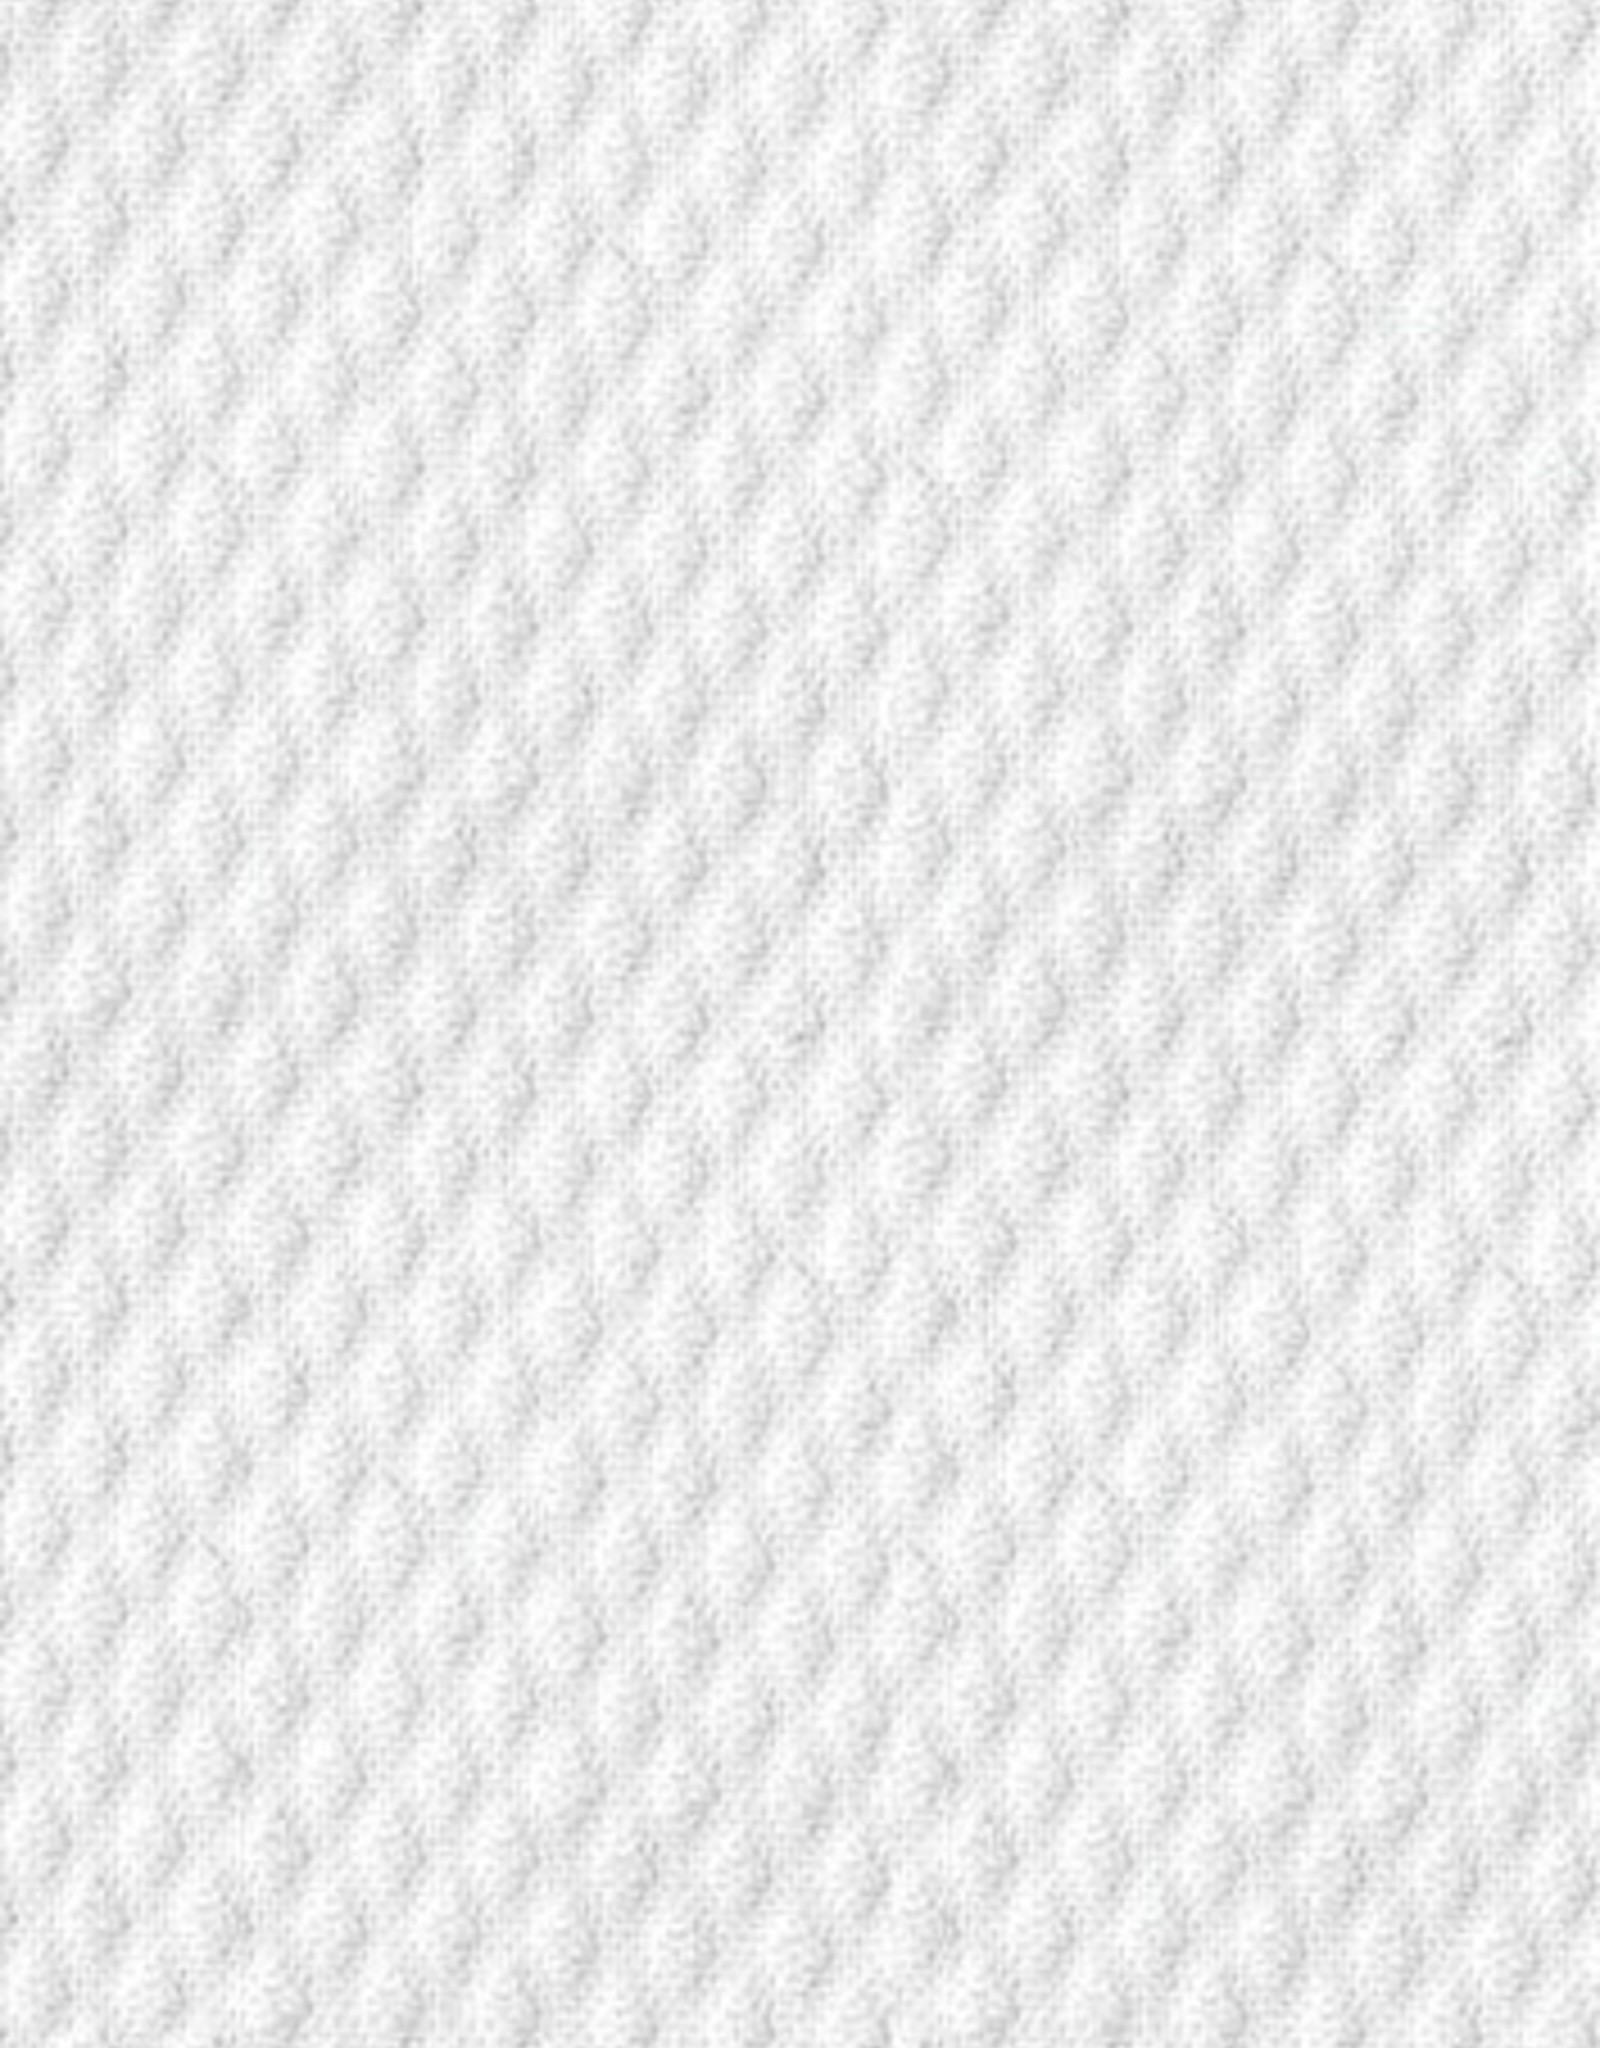 Marquis Tuxedo Slim Fit Dress Shirt Platino 100% Cotton PIQUE White